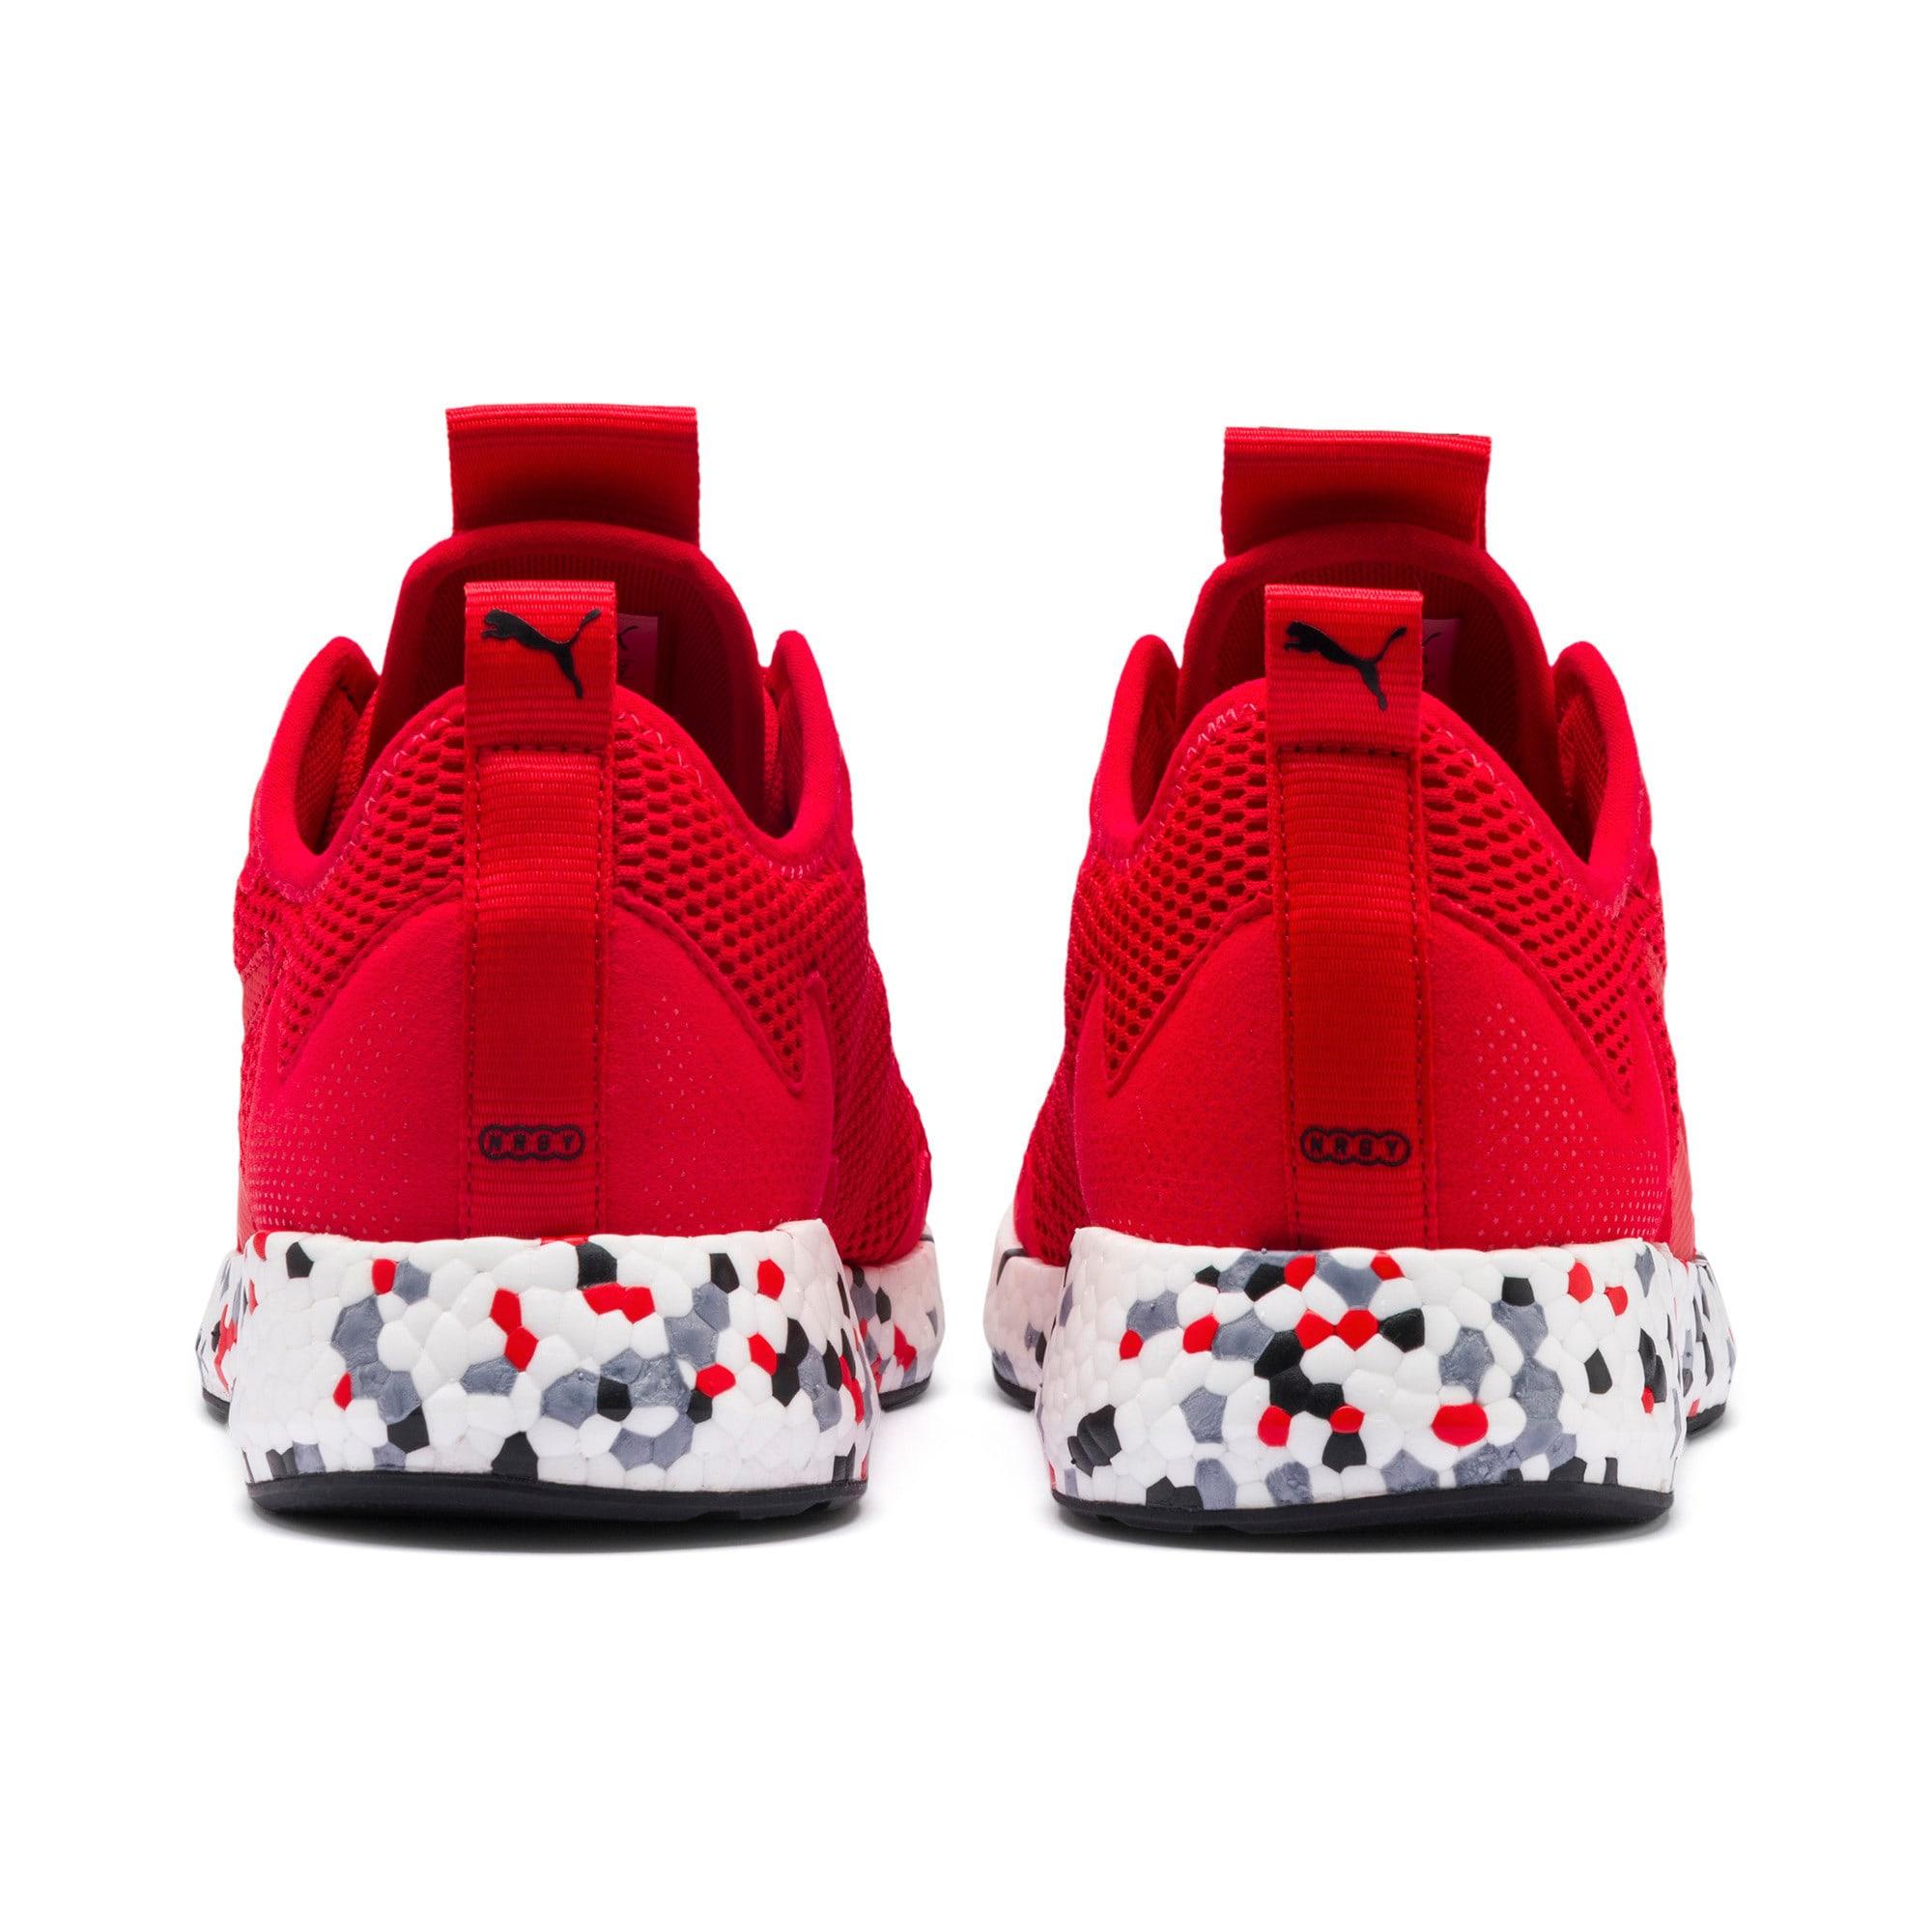 Thumbnail 6 of NRGY Neko Skim Men's Running Shoes, High Risk Red-Puma Black, medium-IND